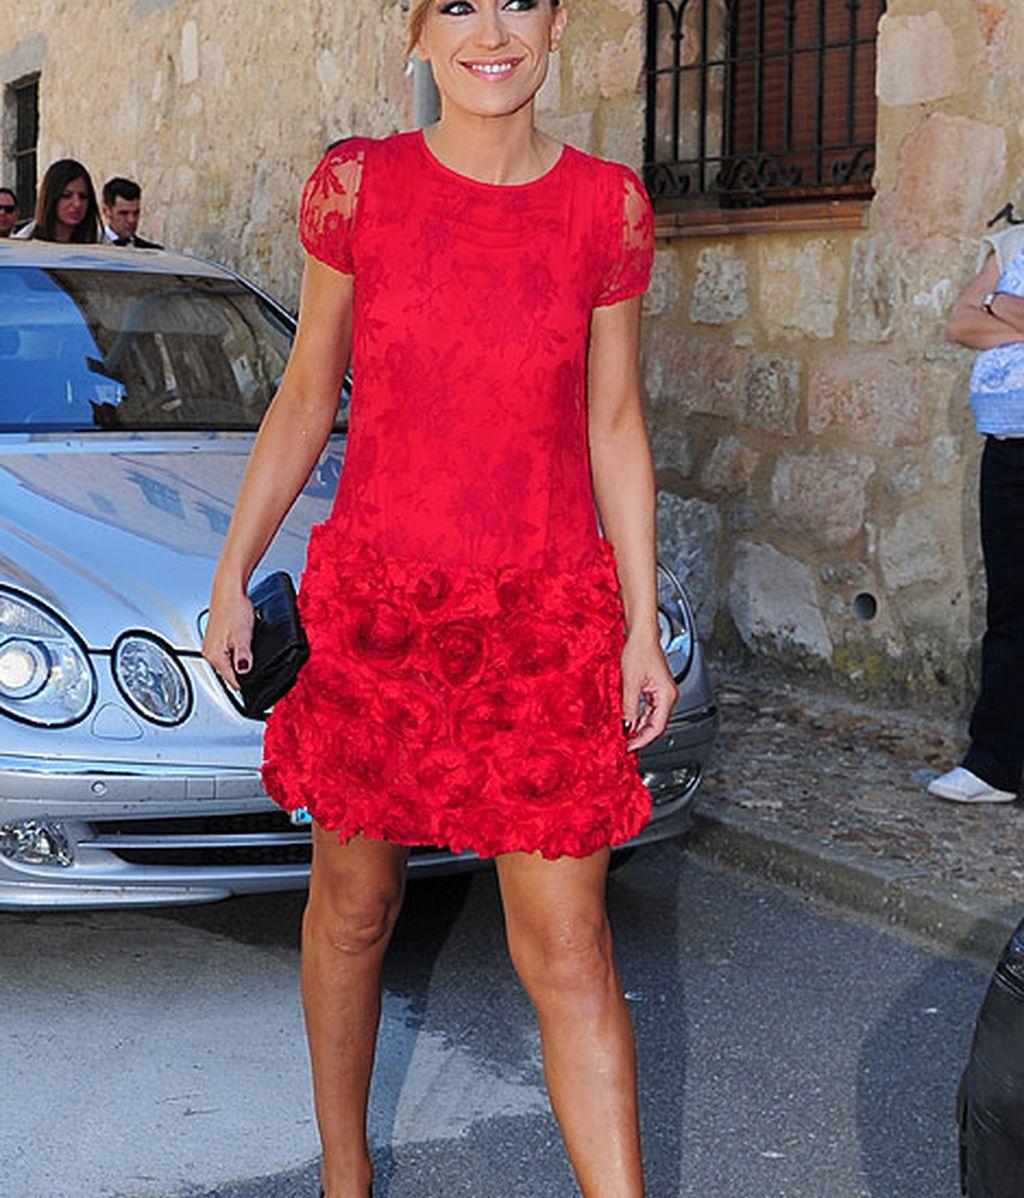 La presentadora Luján Arguelles lució un original vestido rojo